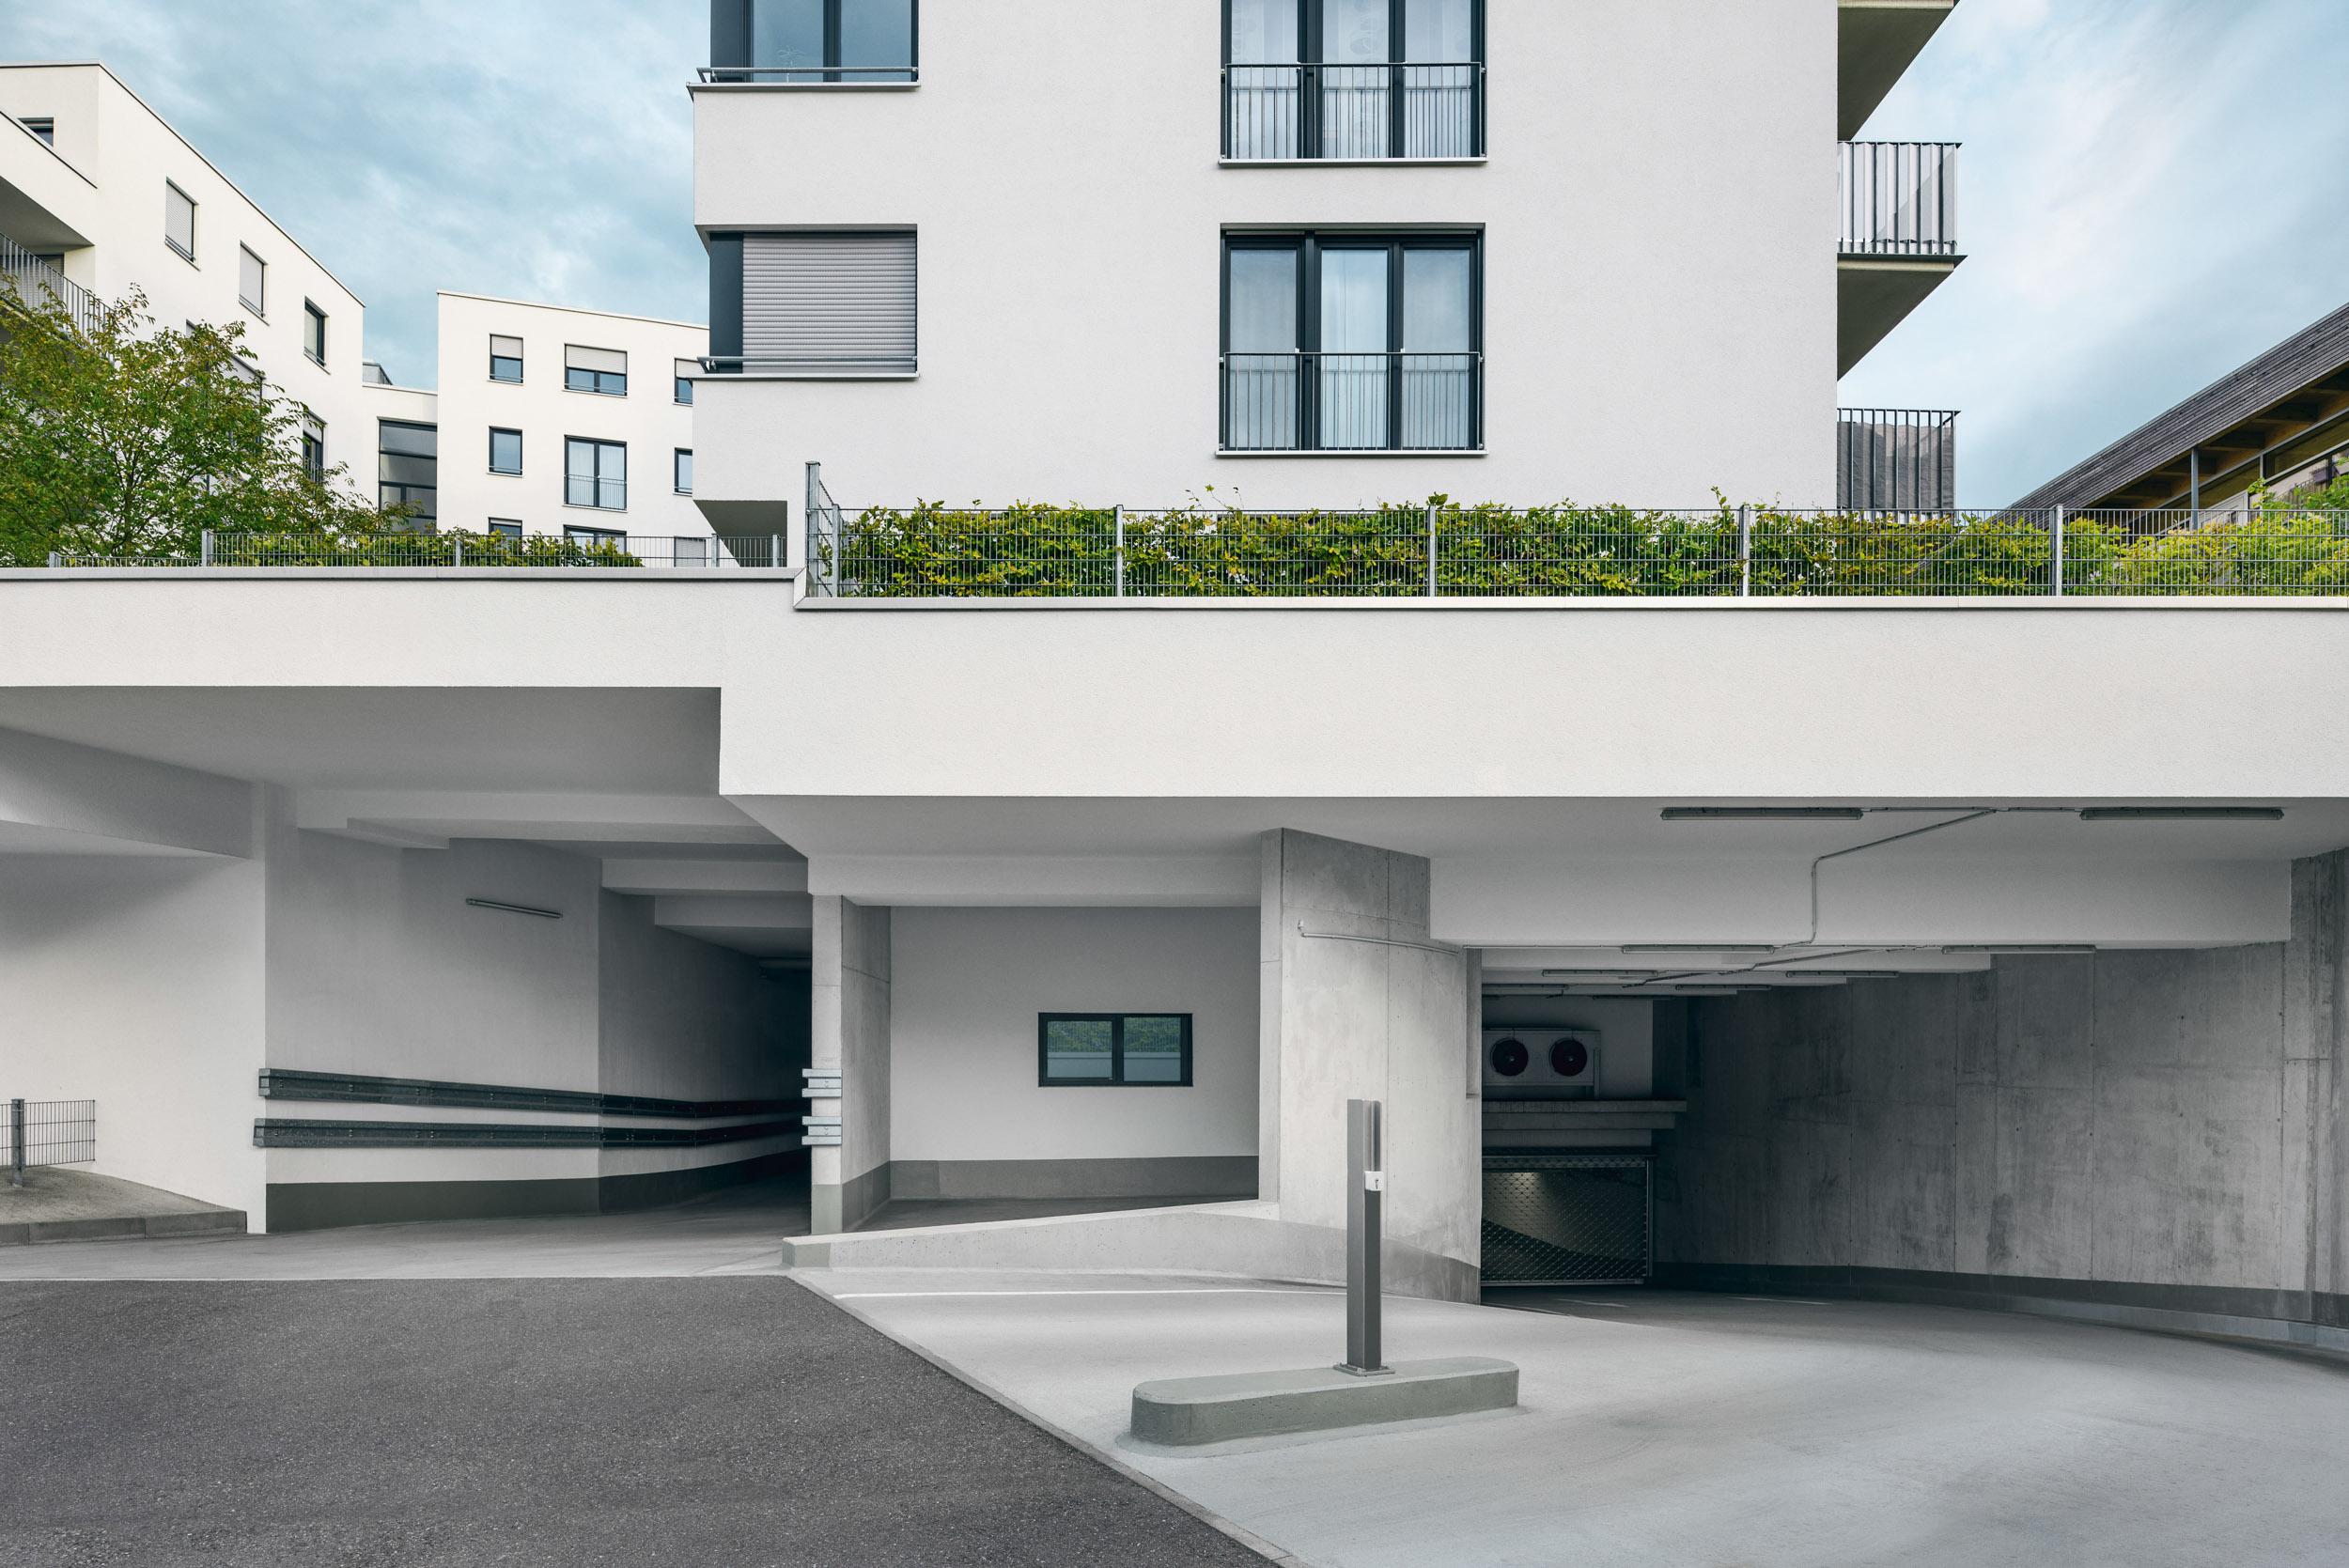 Gustav-Epple-Bauunternehmung-Meluner-Straße-MLX8130